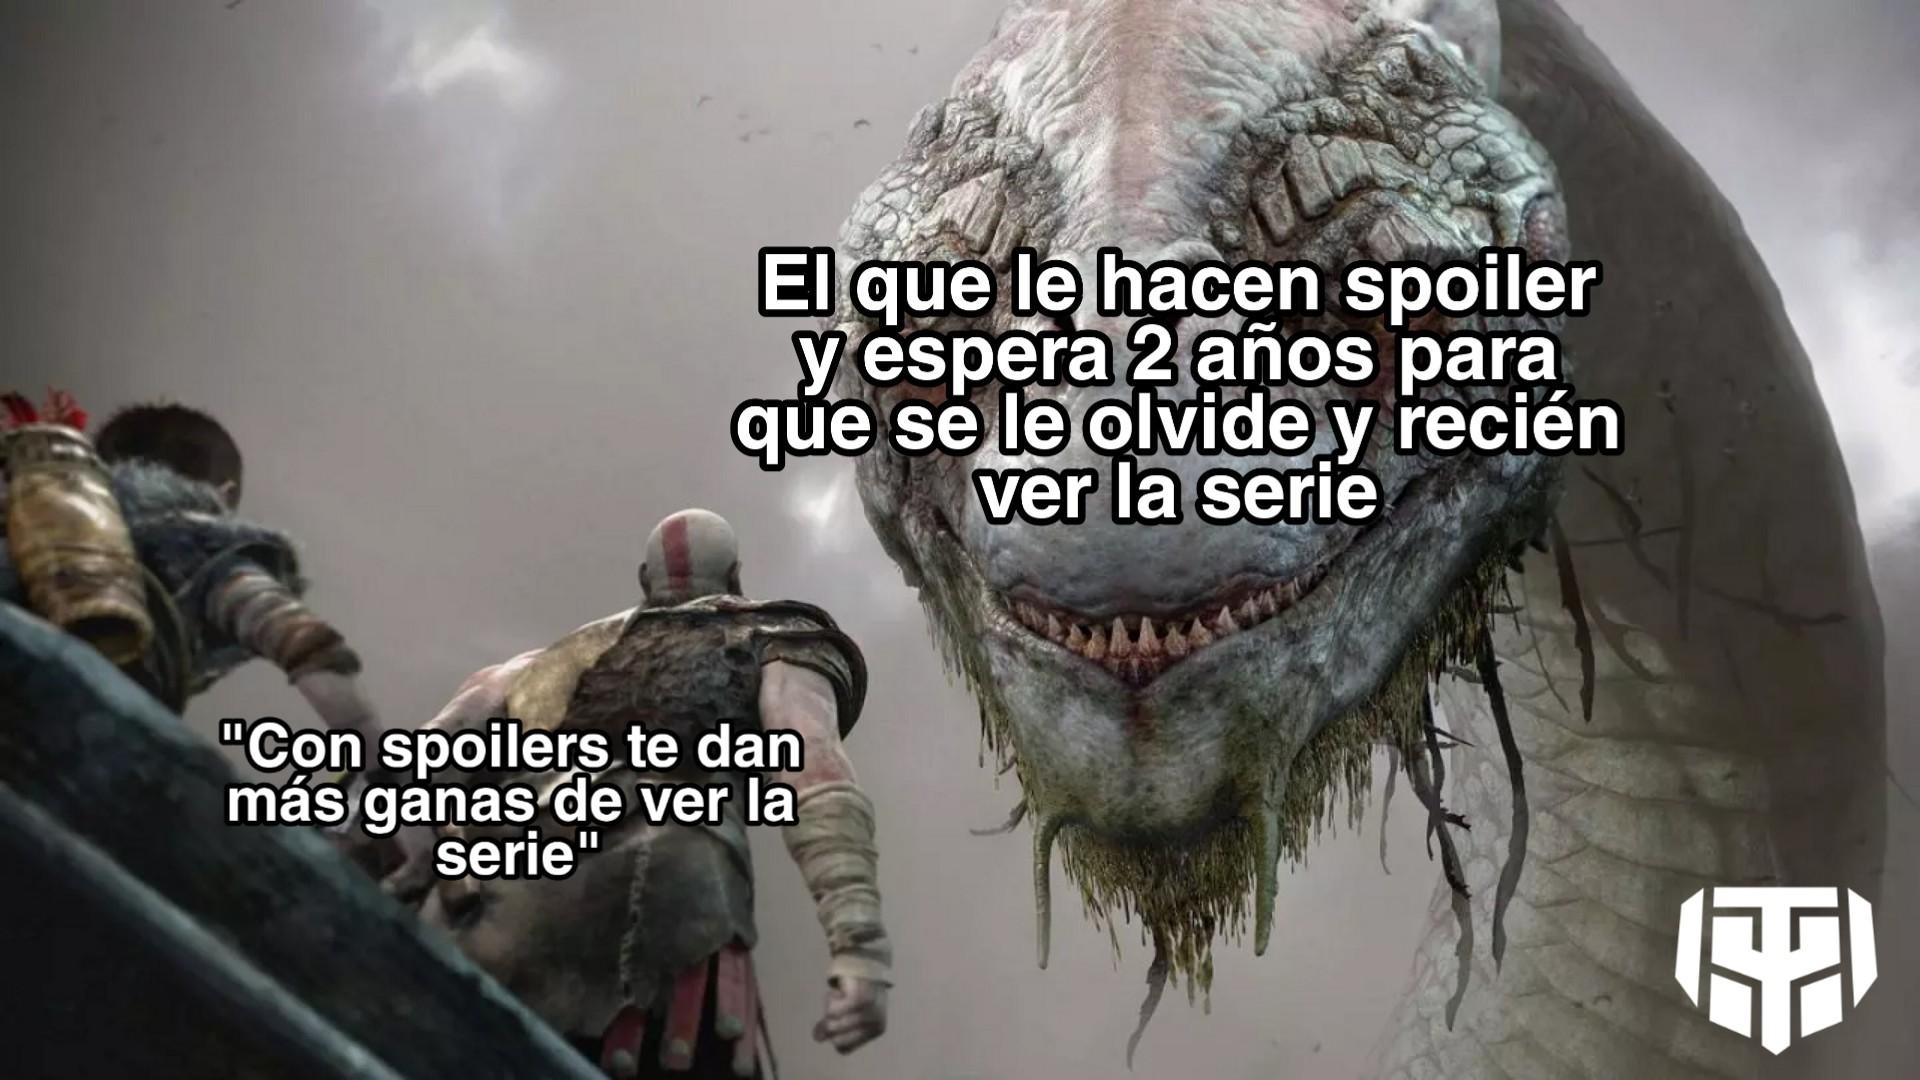 Jürmungadr vs kratos - meme